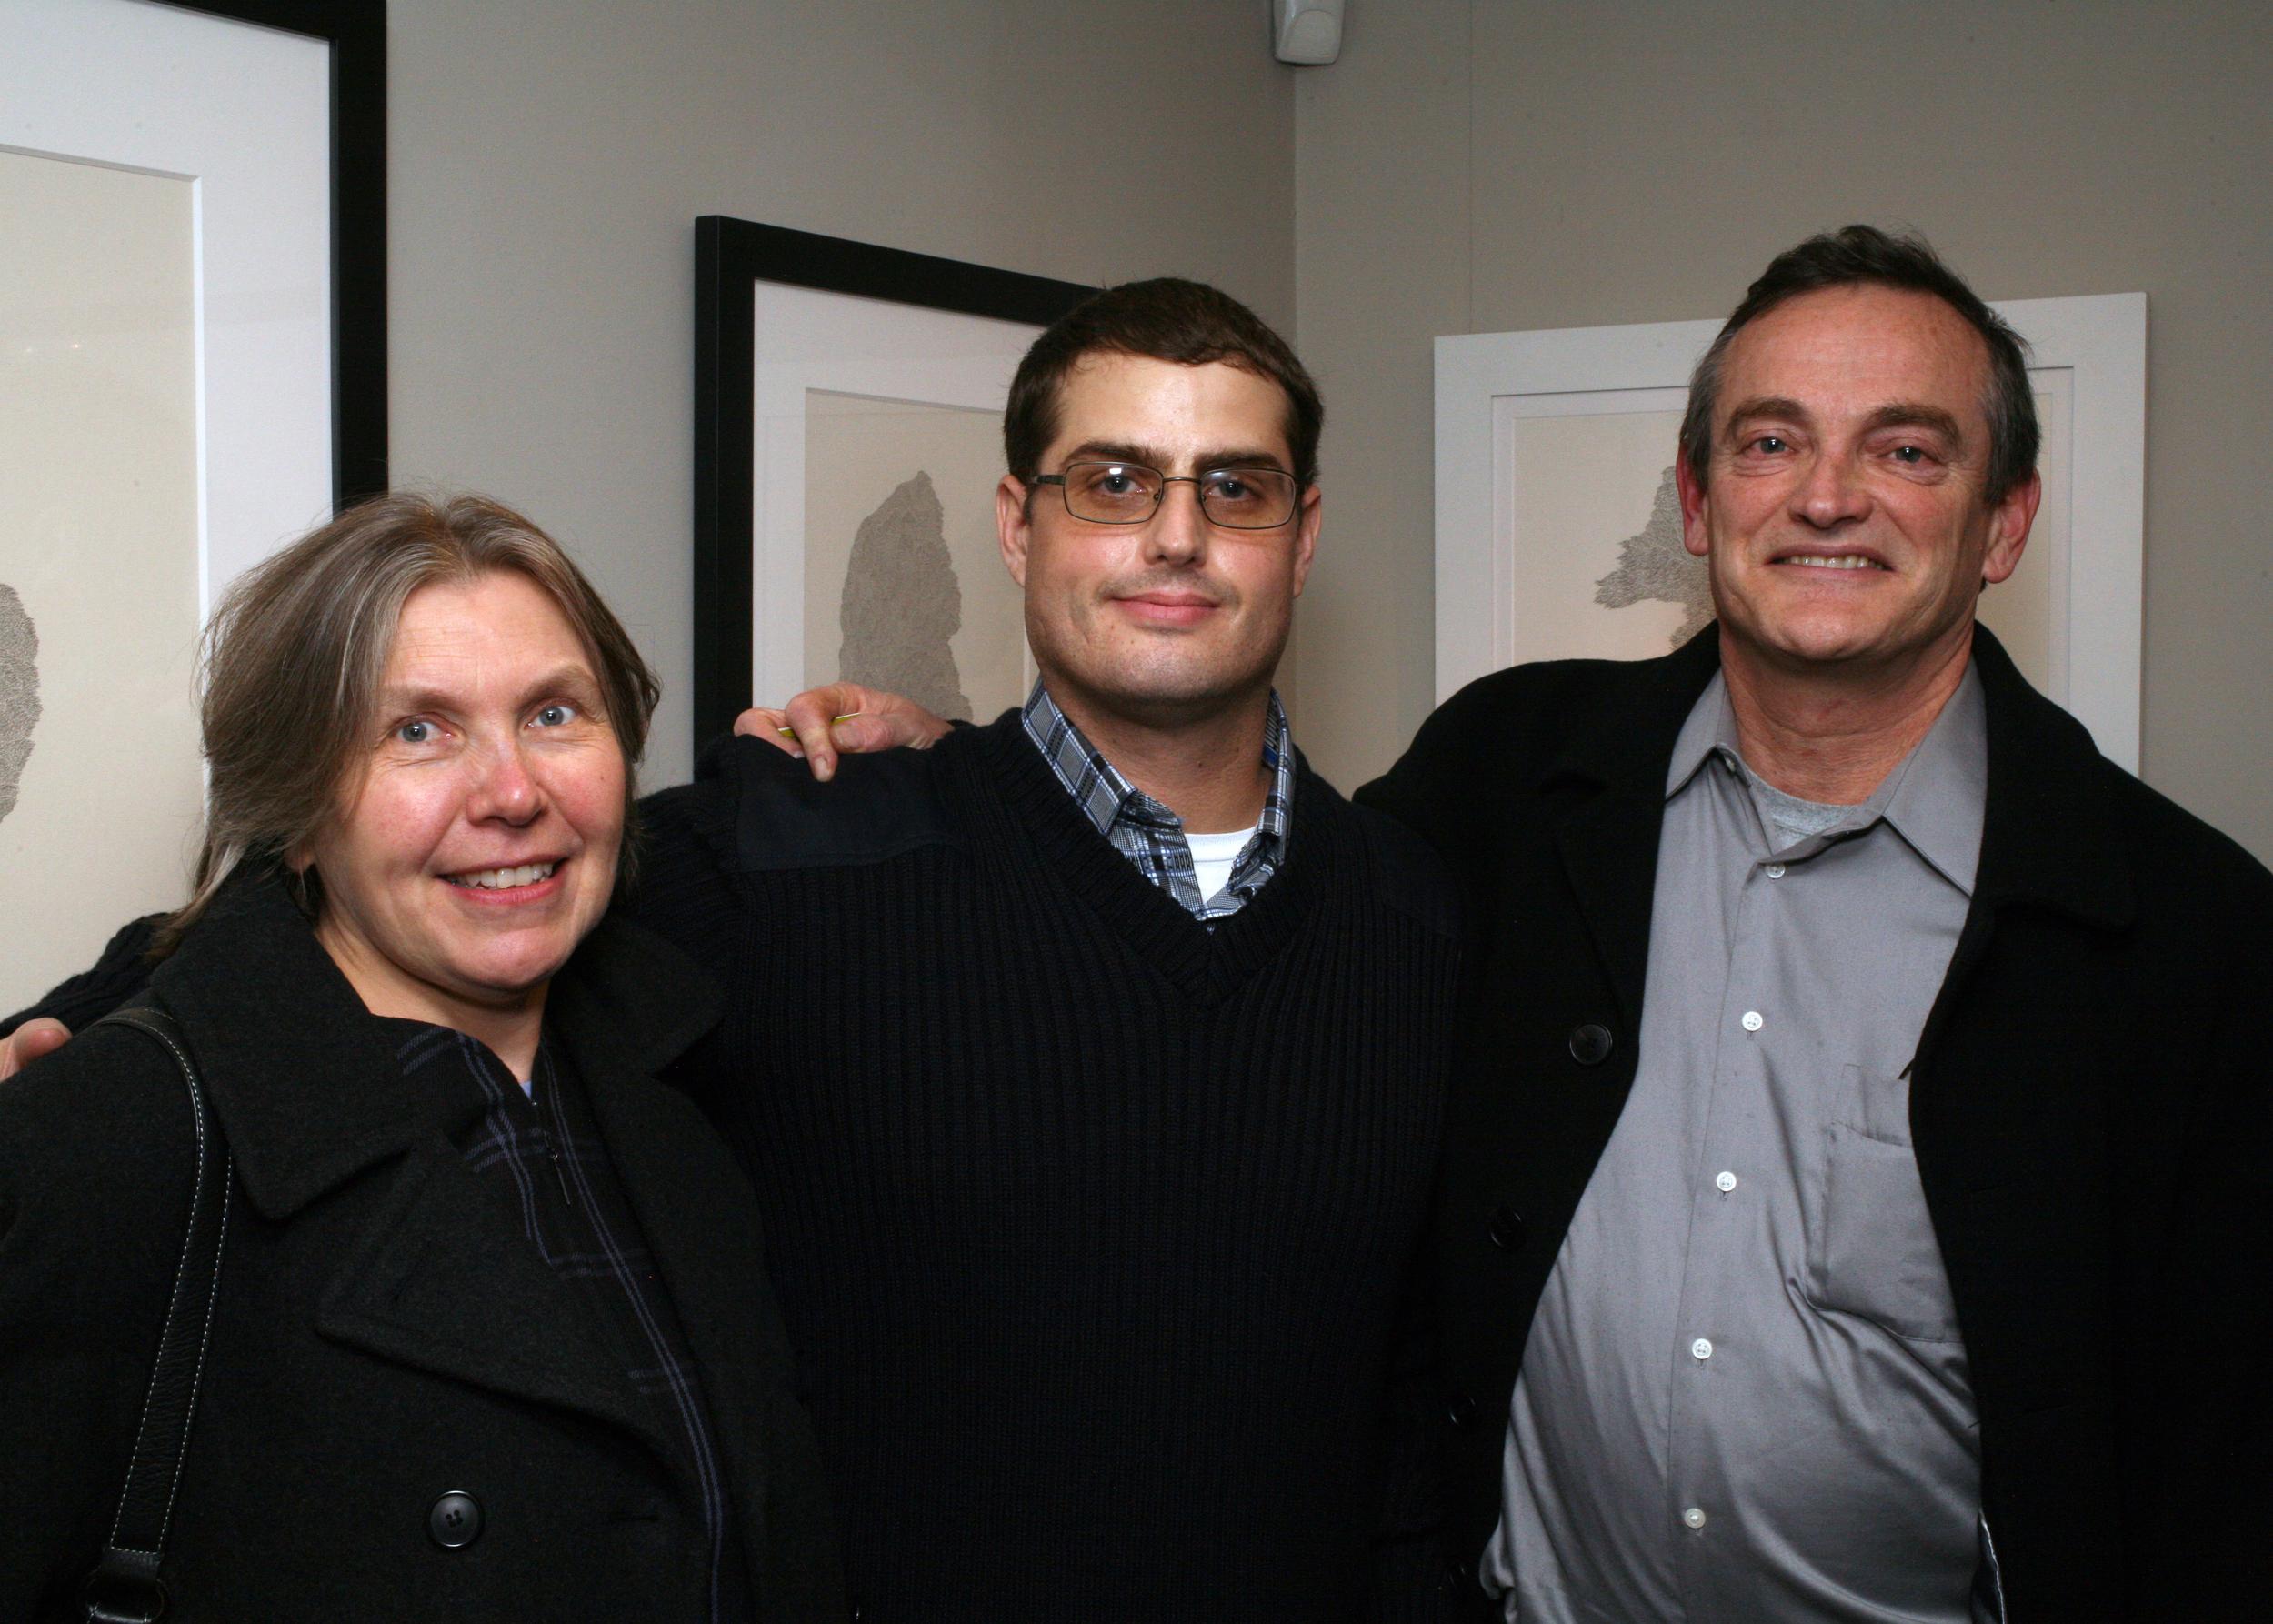 IMG_2477 Sylvia, Edward and Jim Kingsbury.JPG